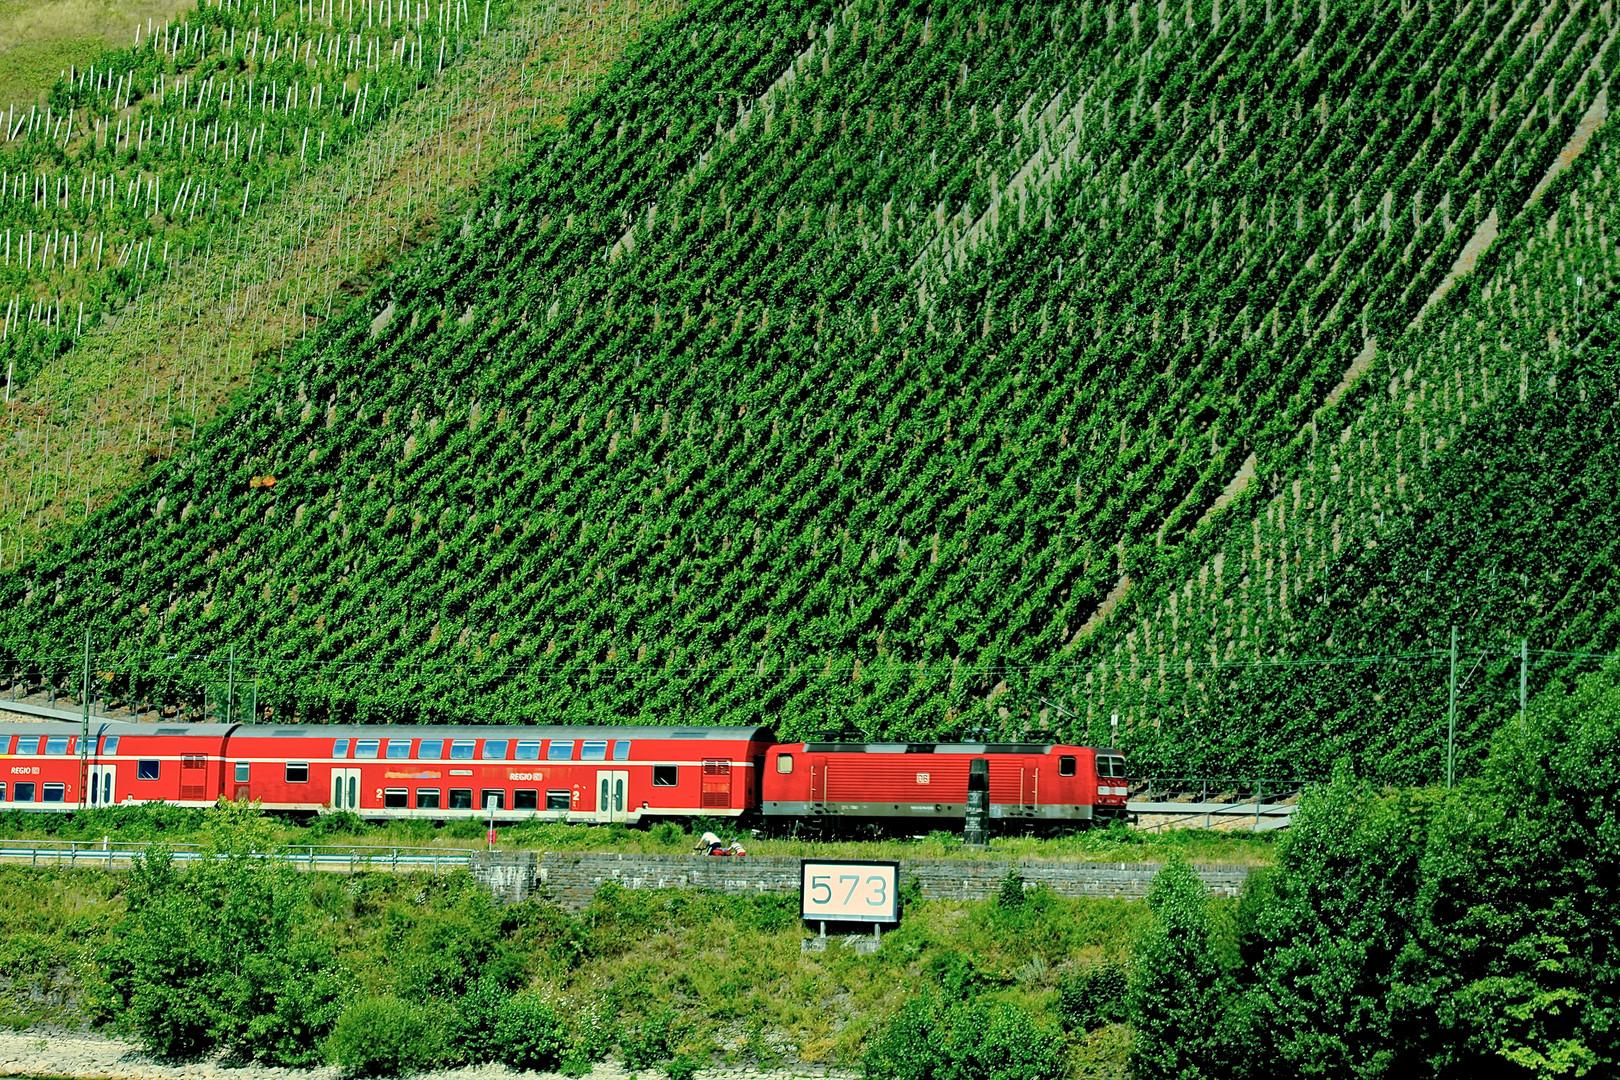 Boppard Rheinkilometer 573